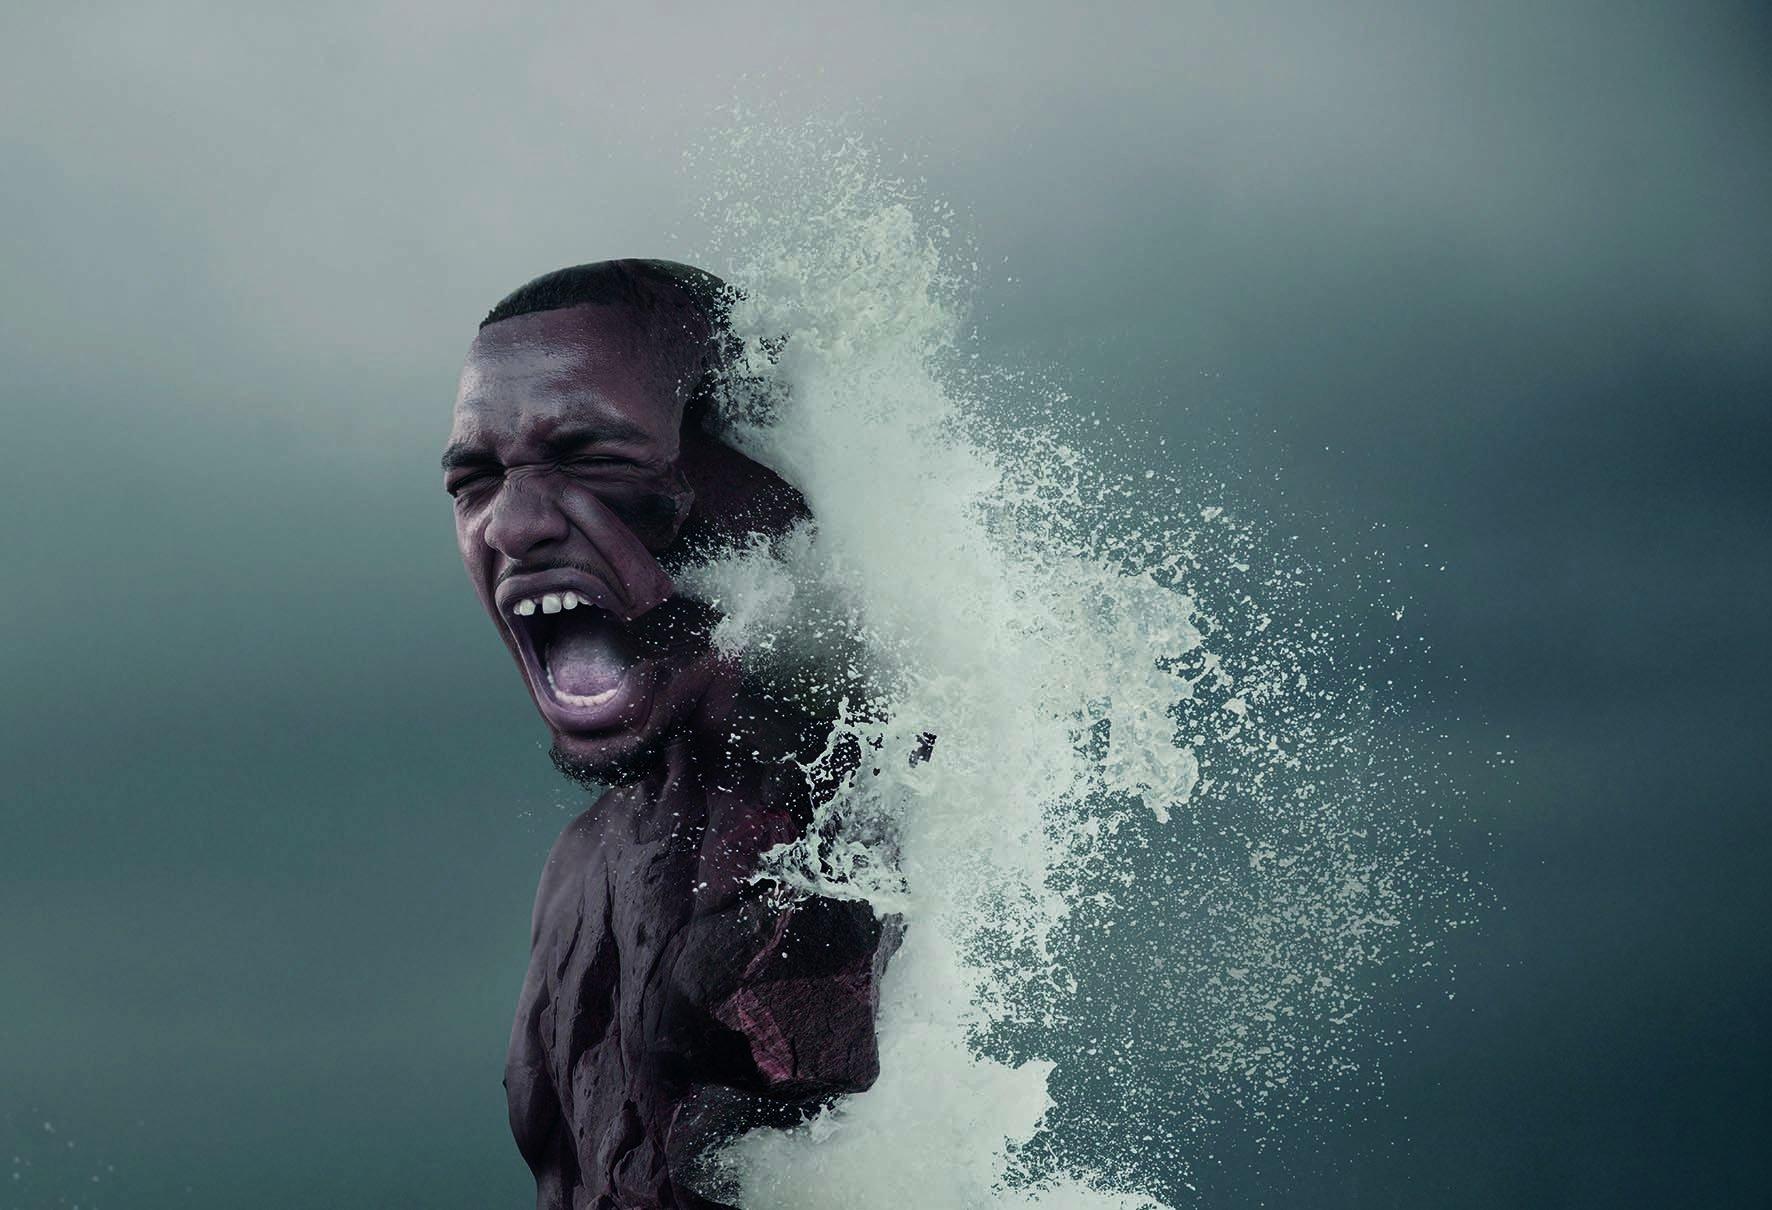 Juventude negra no Brasil está sendo eliminada, segundo Atlas da Violência